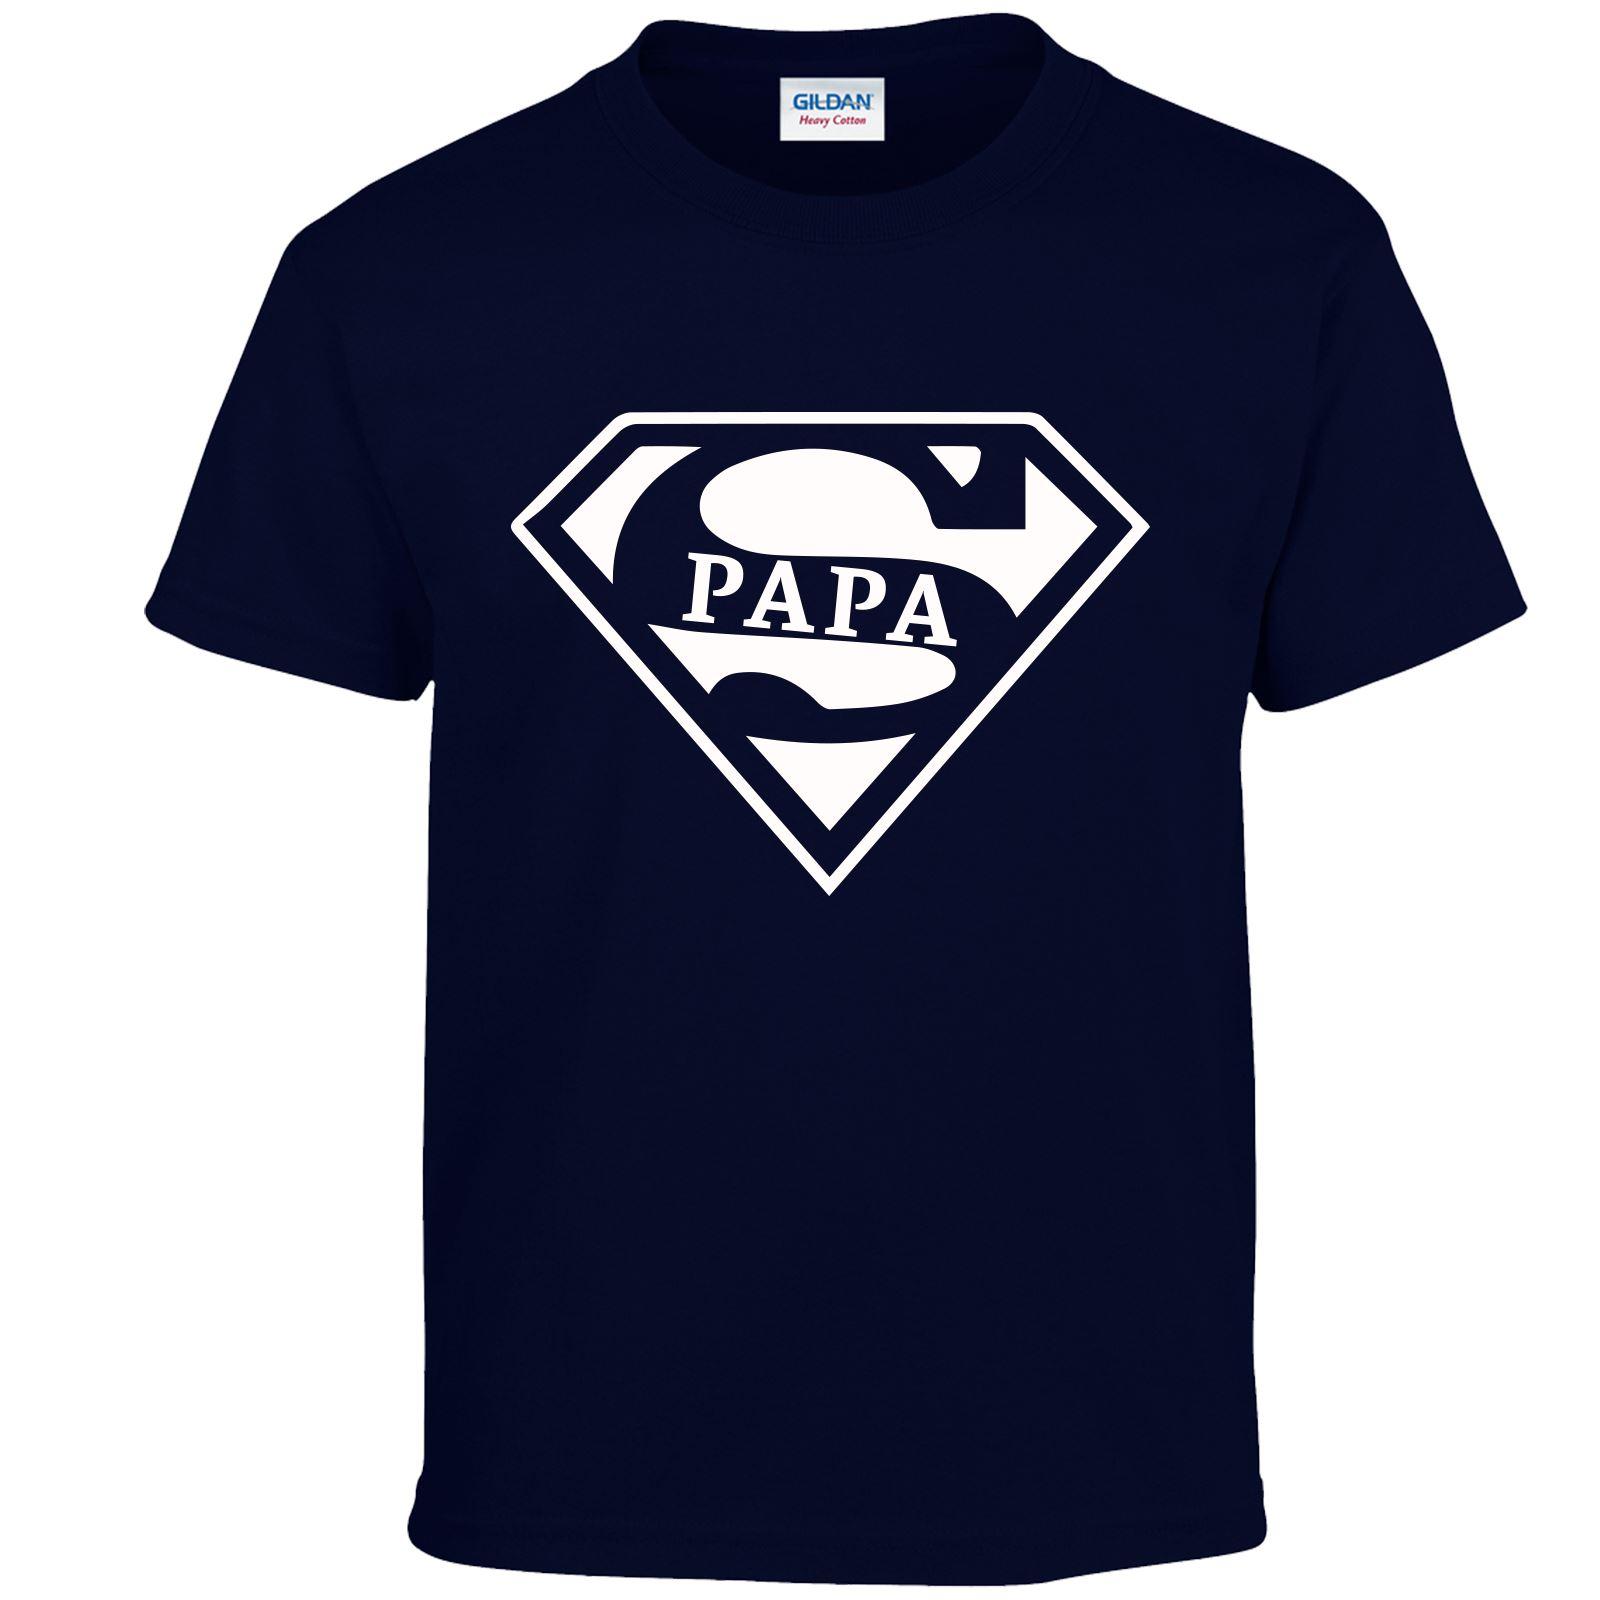 Super Papa Boys Girls T Shirt Standard Birthday Idea Gift Present Awesome Wear